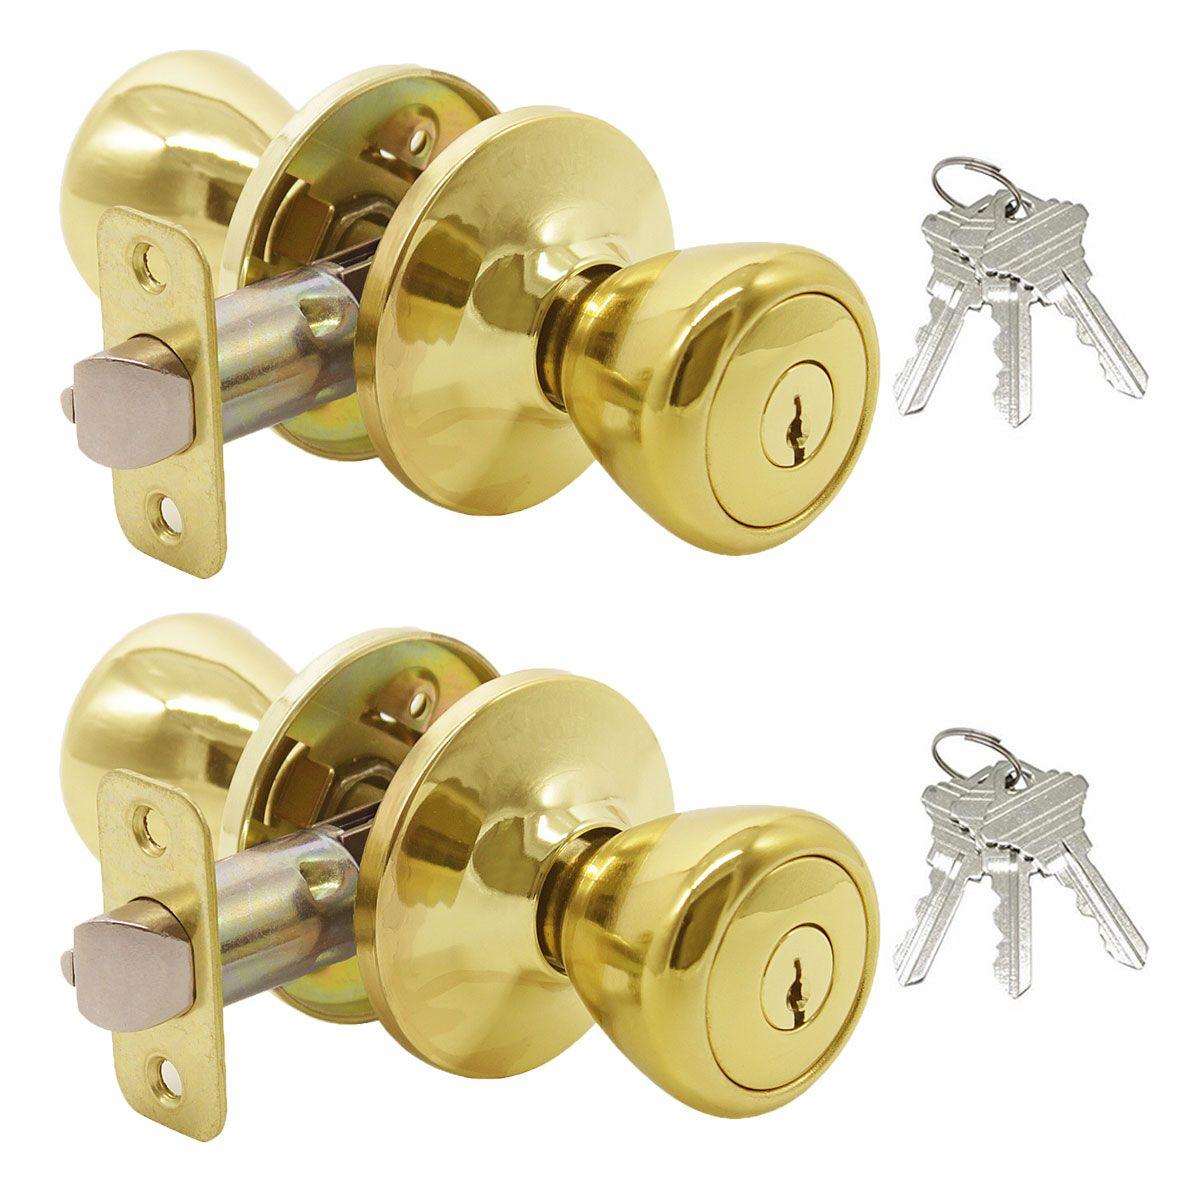 Single Connecting Rod Door Knobs Entranceprivacypassagedummy